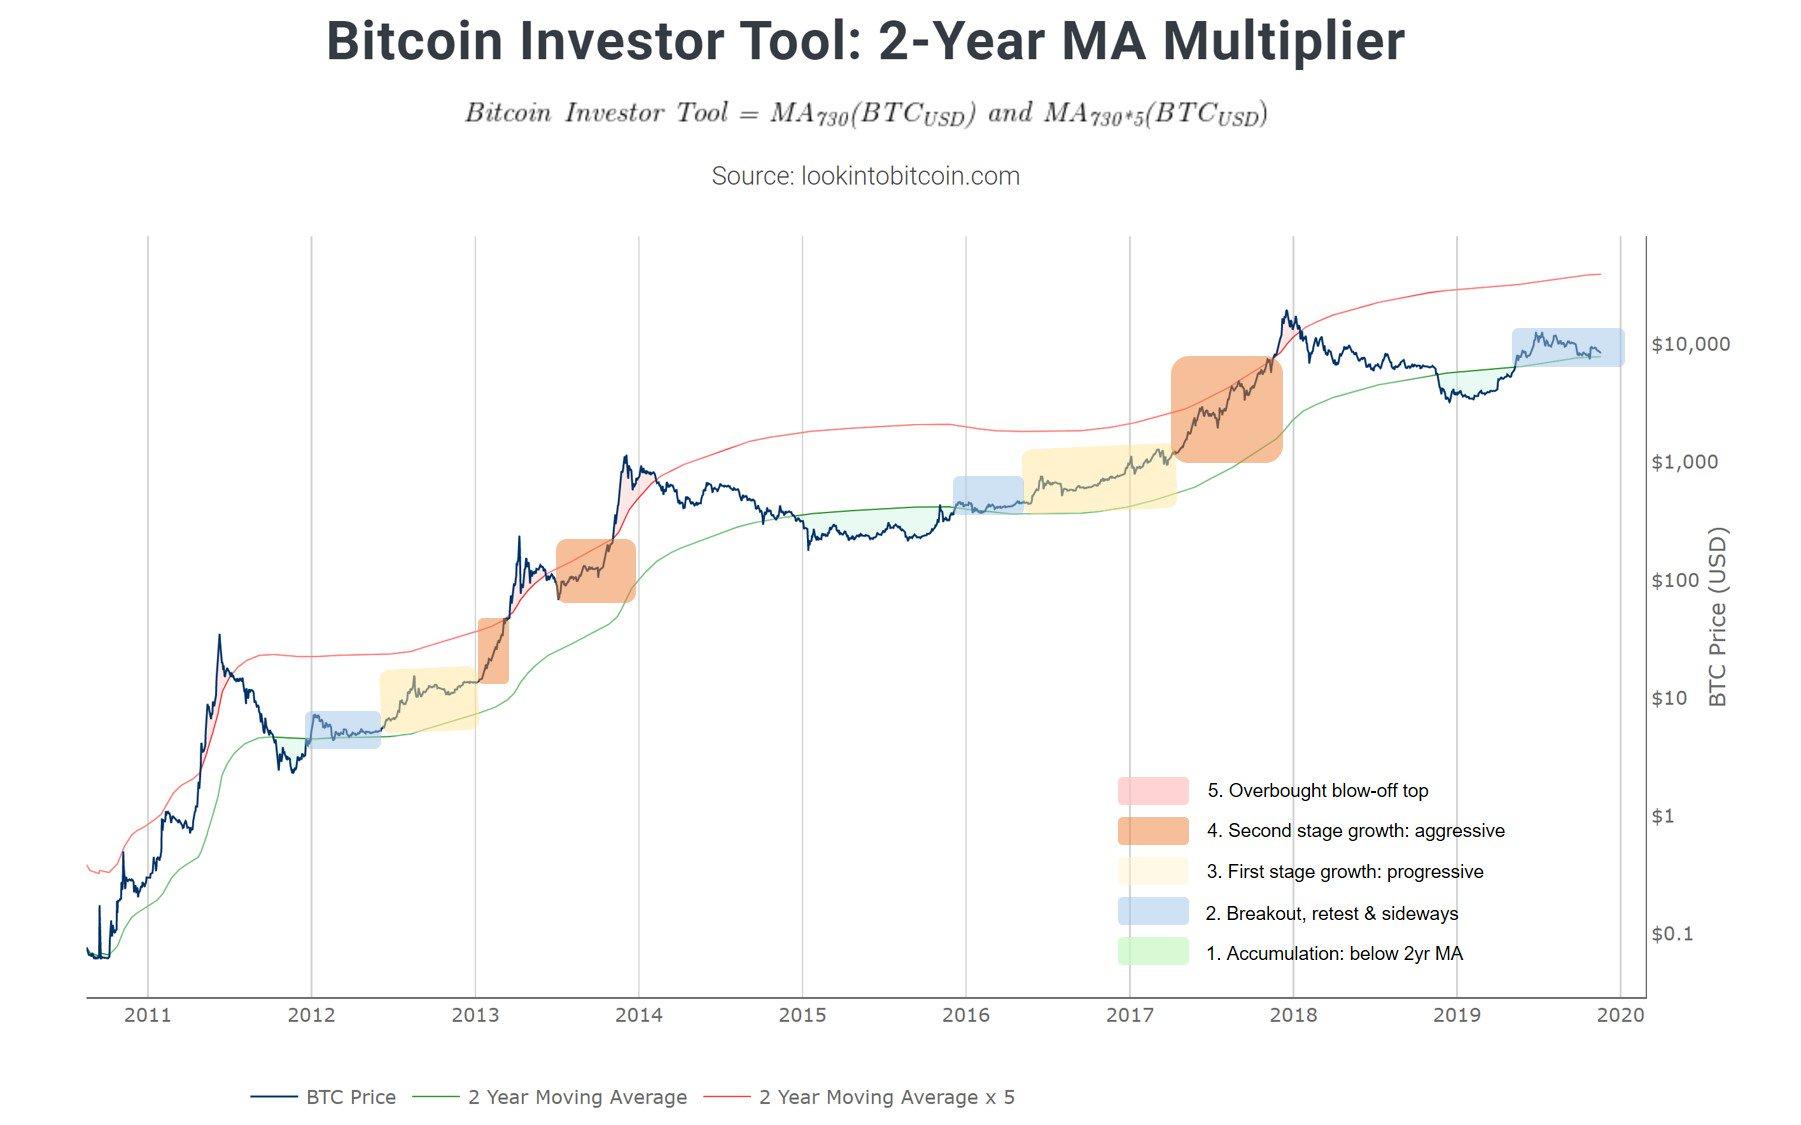 Bitcoin historical US dollar price chart